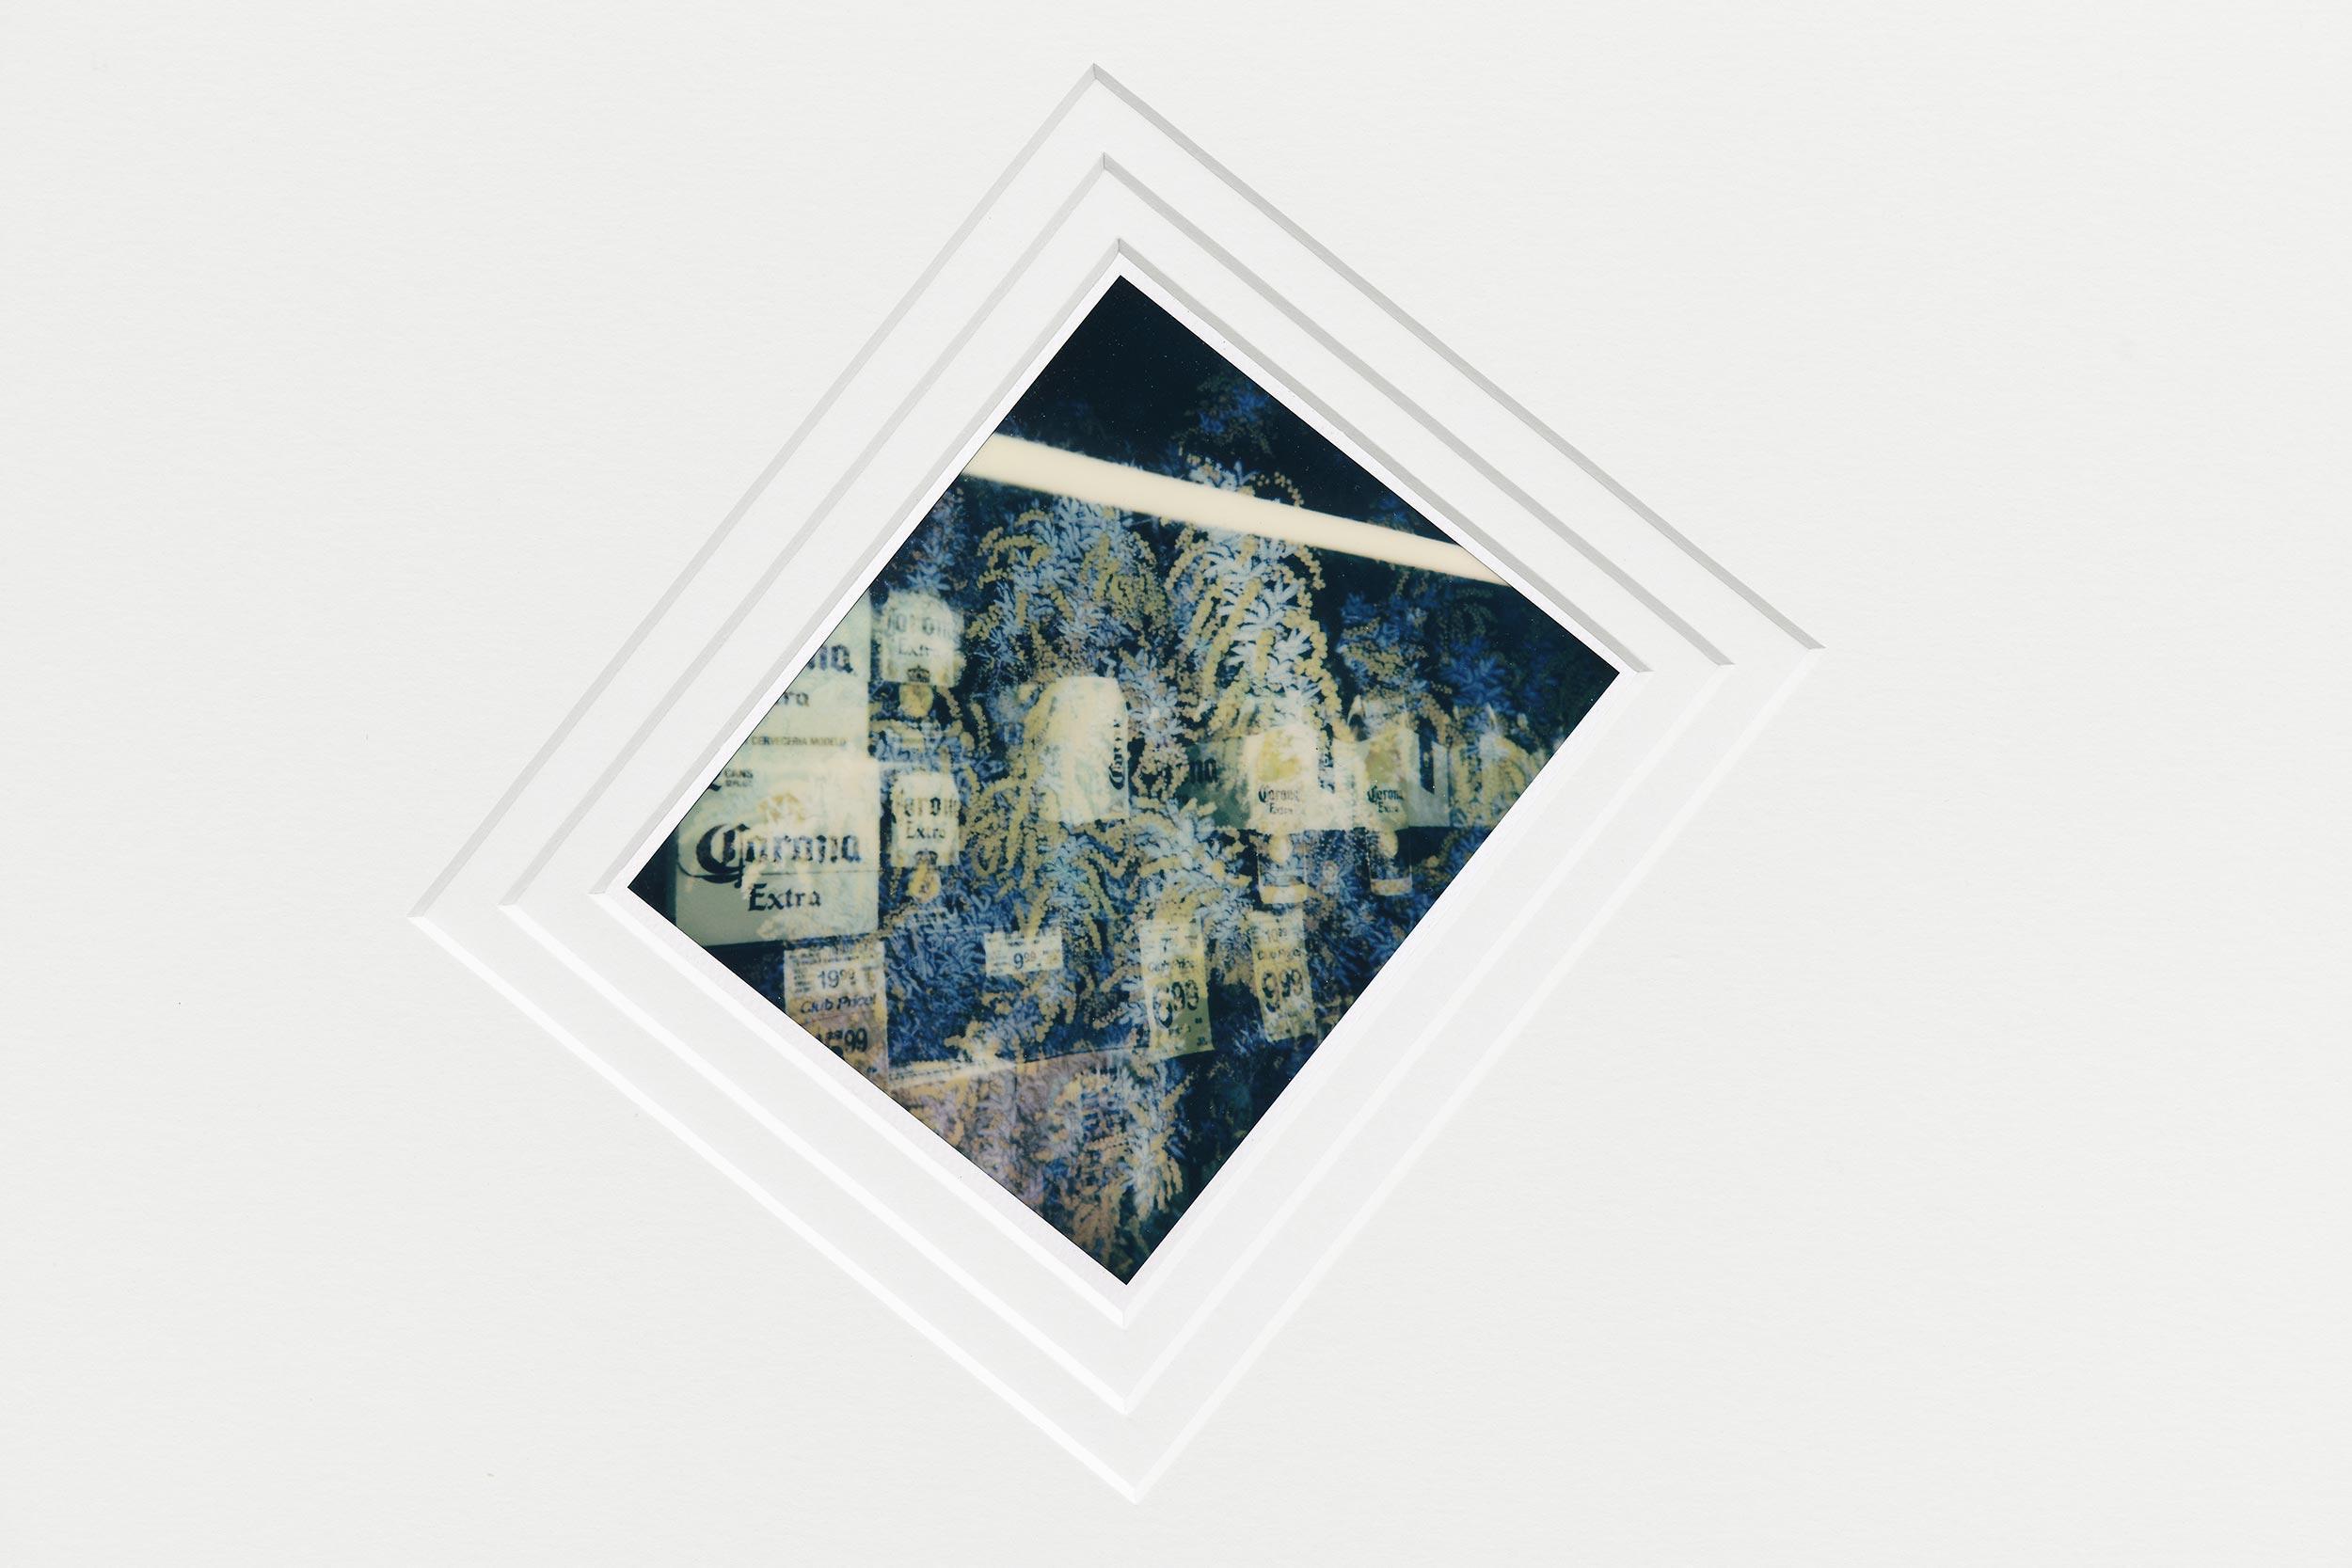 Cyprien Gaillard, exposition